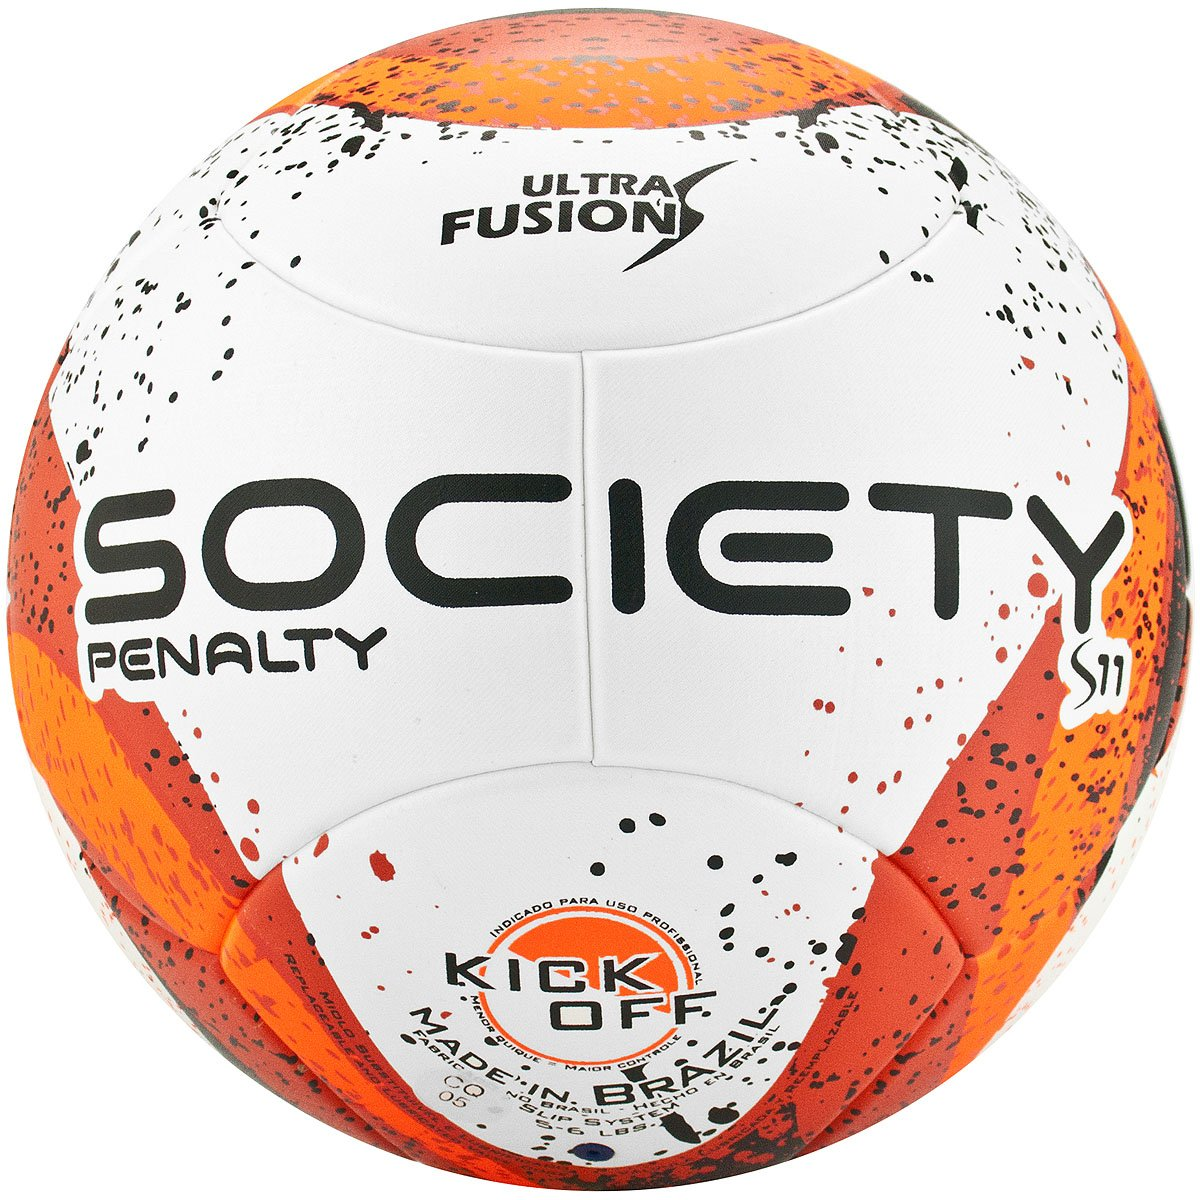 e5c75c0f4 Bola Penalty Society S11 R3 Ultra Fusion VII